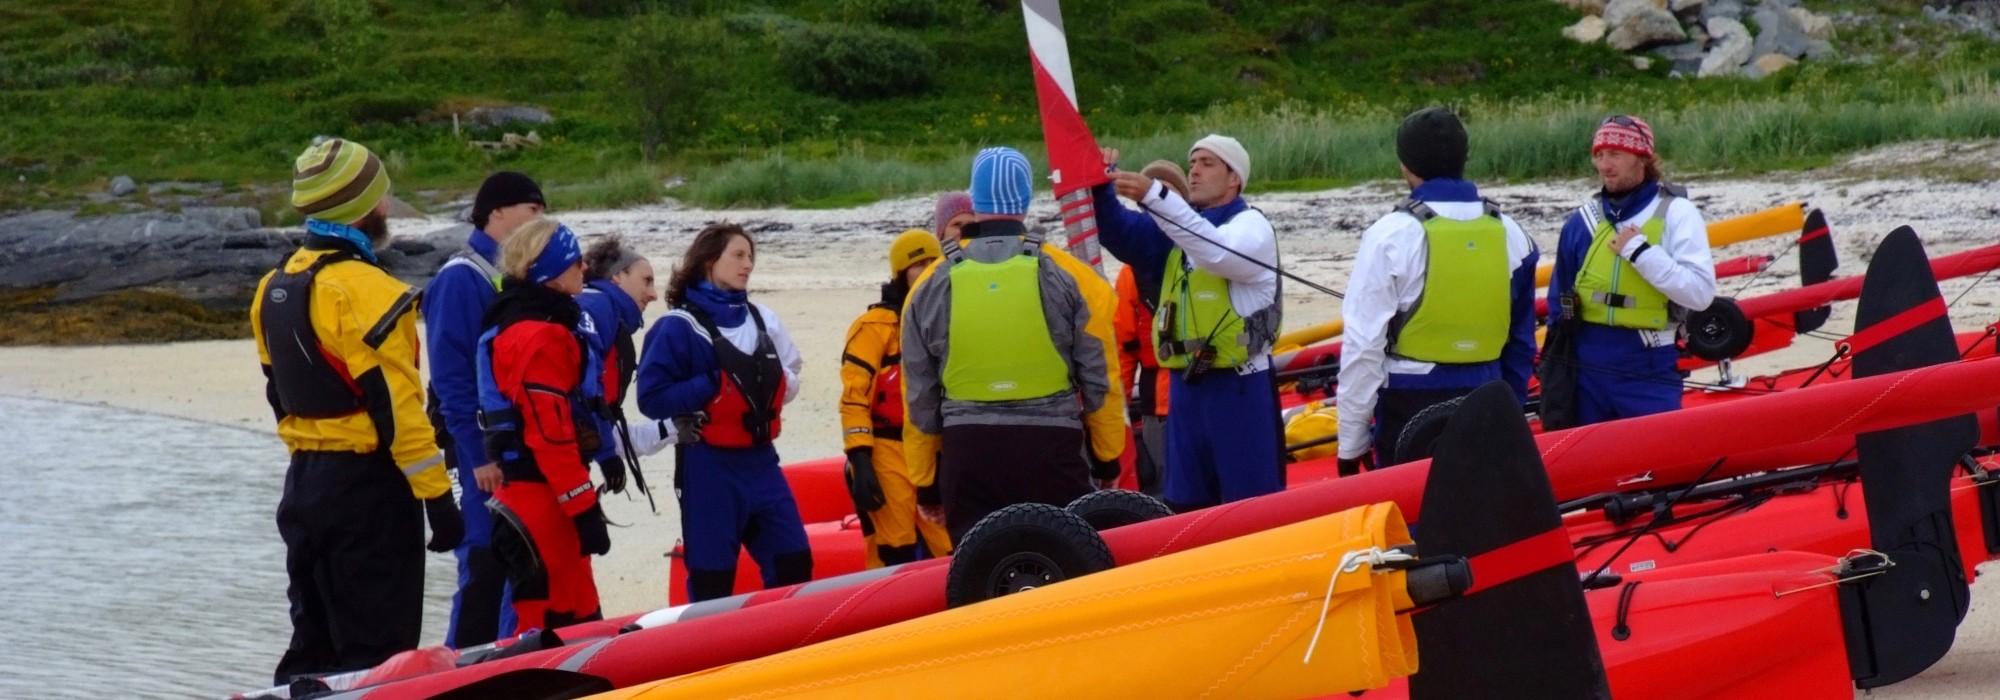 hobie kayak à louer à Sommaroy